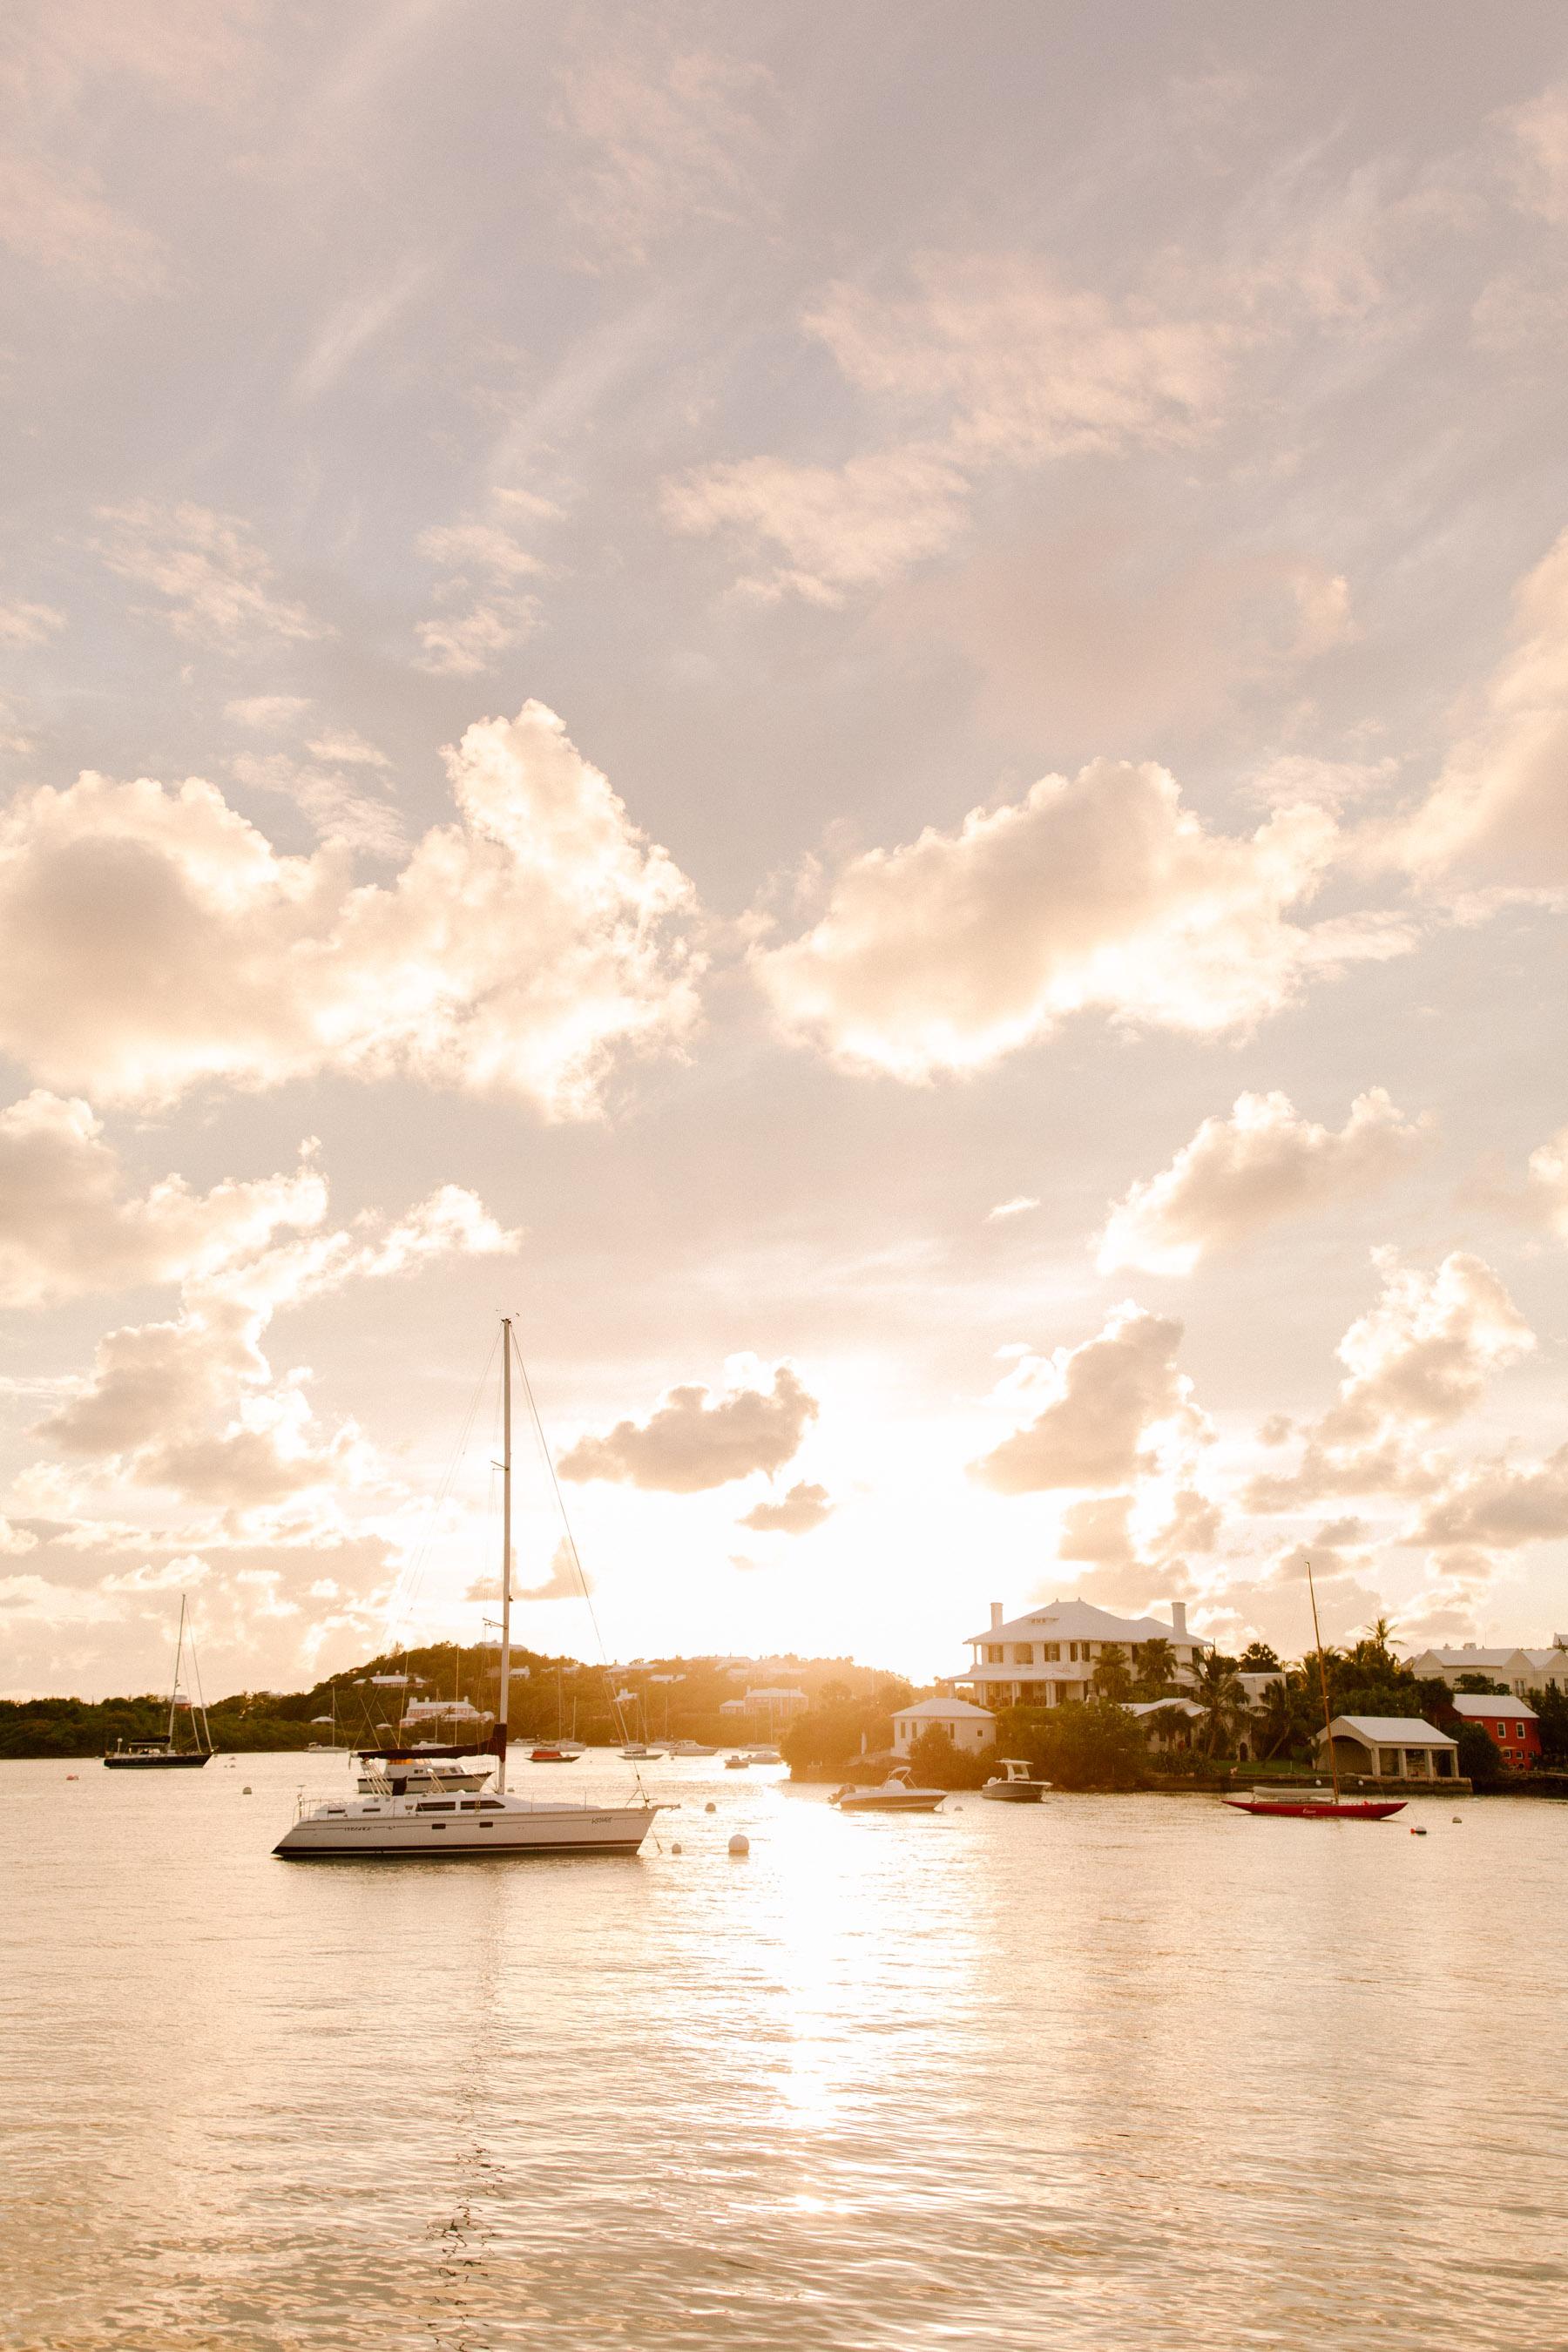 Bermuda - Kelly in the City